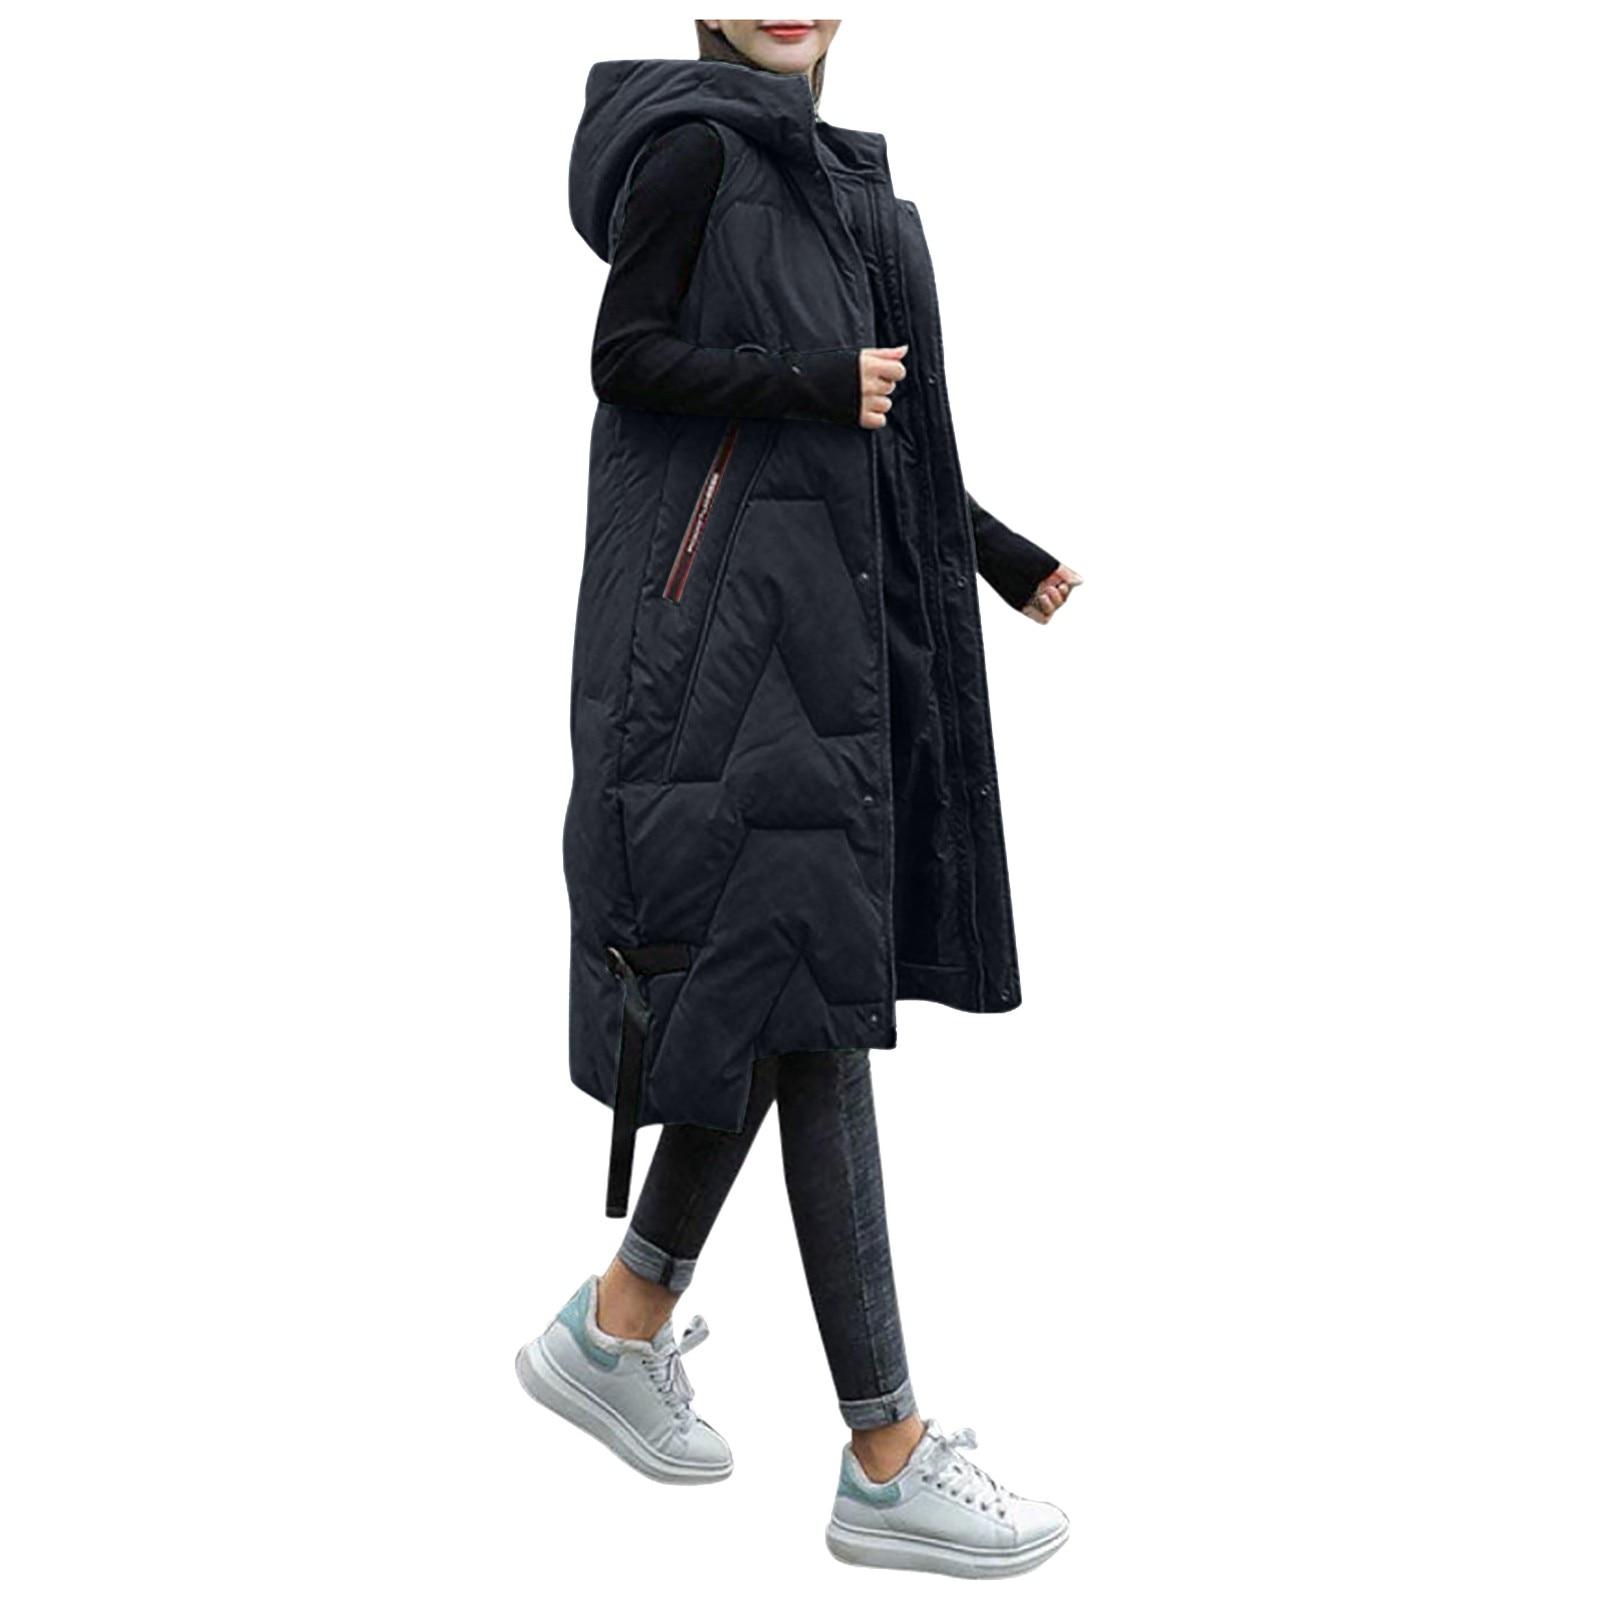 Autumn Winter Vest Women Waistcoat 2021 Female Sleeveless Vest Jacket Hooded Warm Long Vest Coat Plus Size Slim Warm Waistcoat